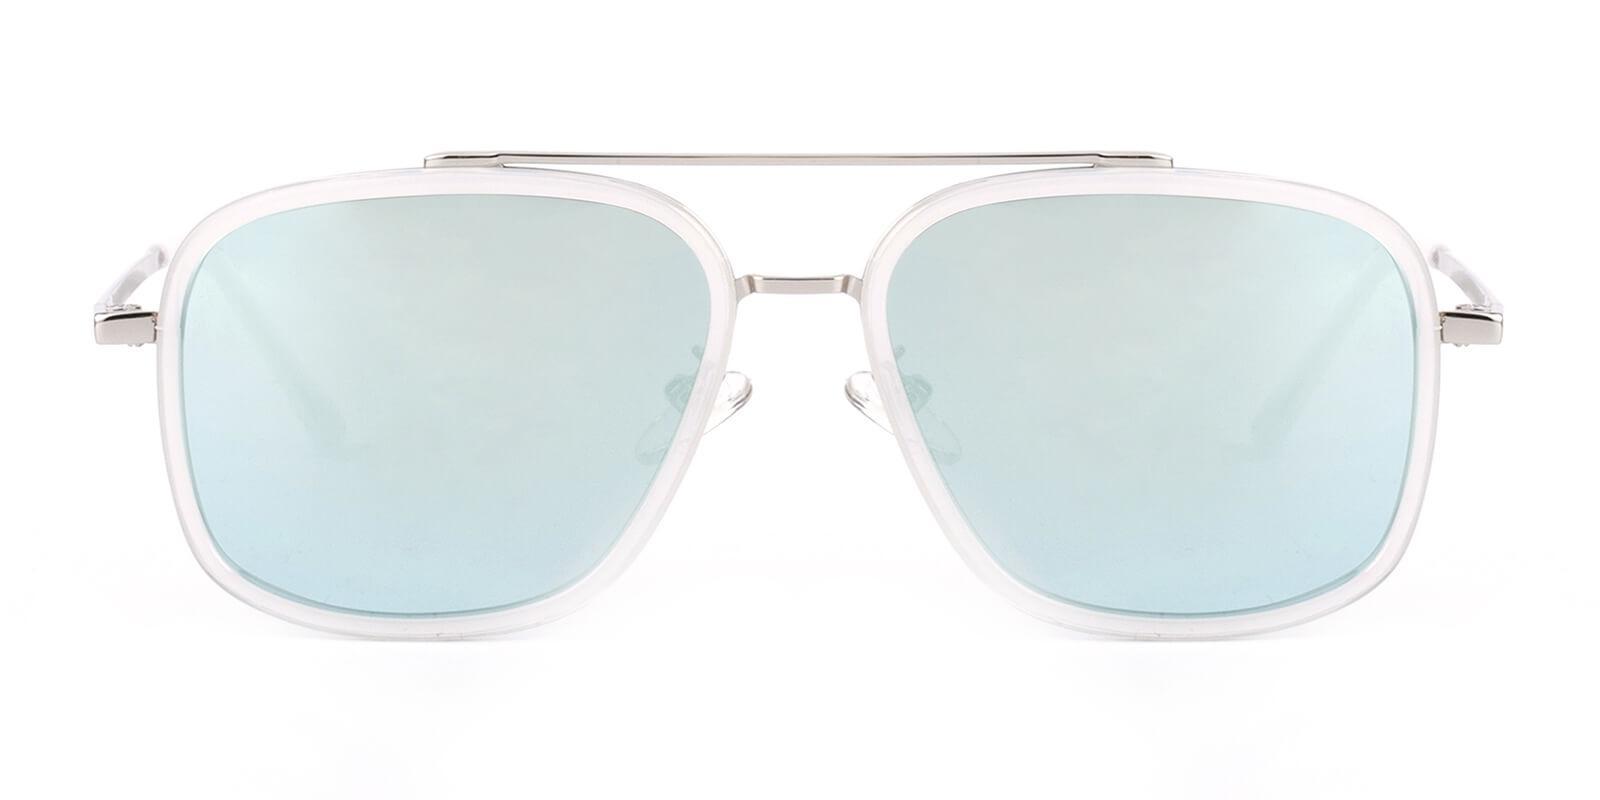 Clinton-Translucent-Aviator-Metal / Combination / TR-Sunglasses-additional2